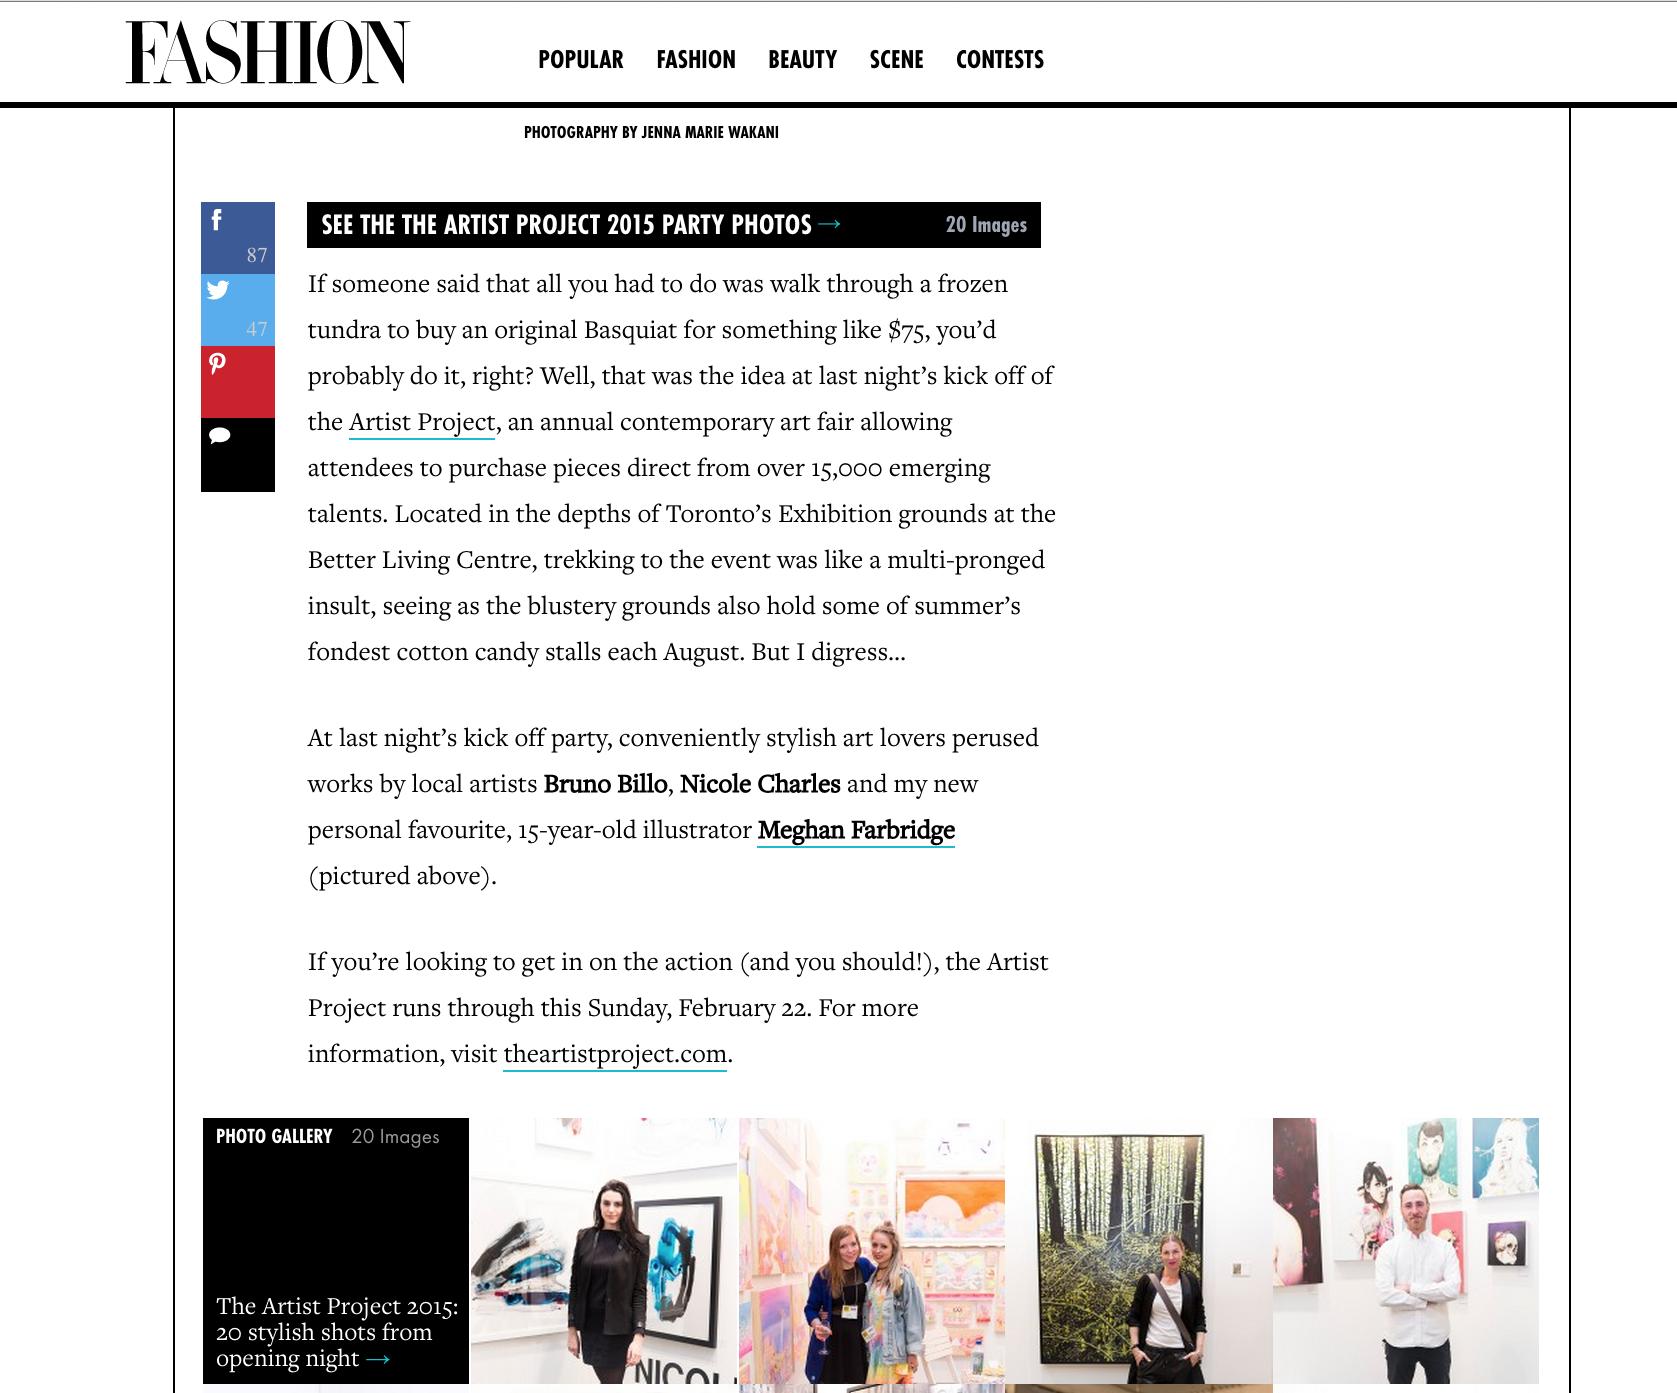 Fashion Magazine, 2015 (2/2)